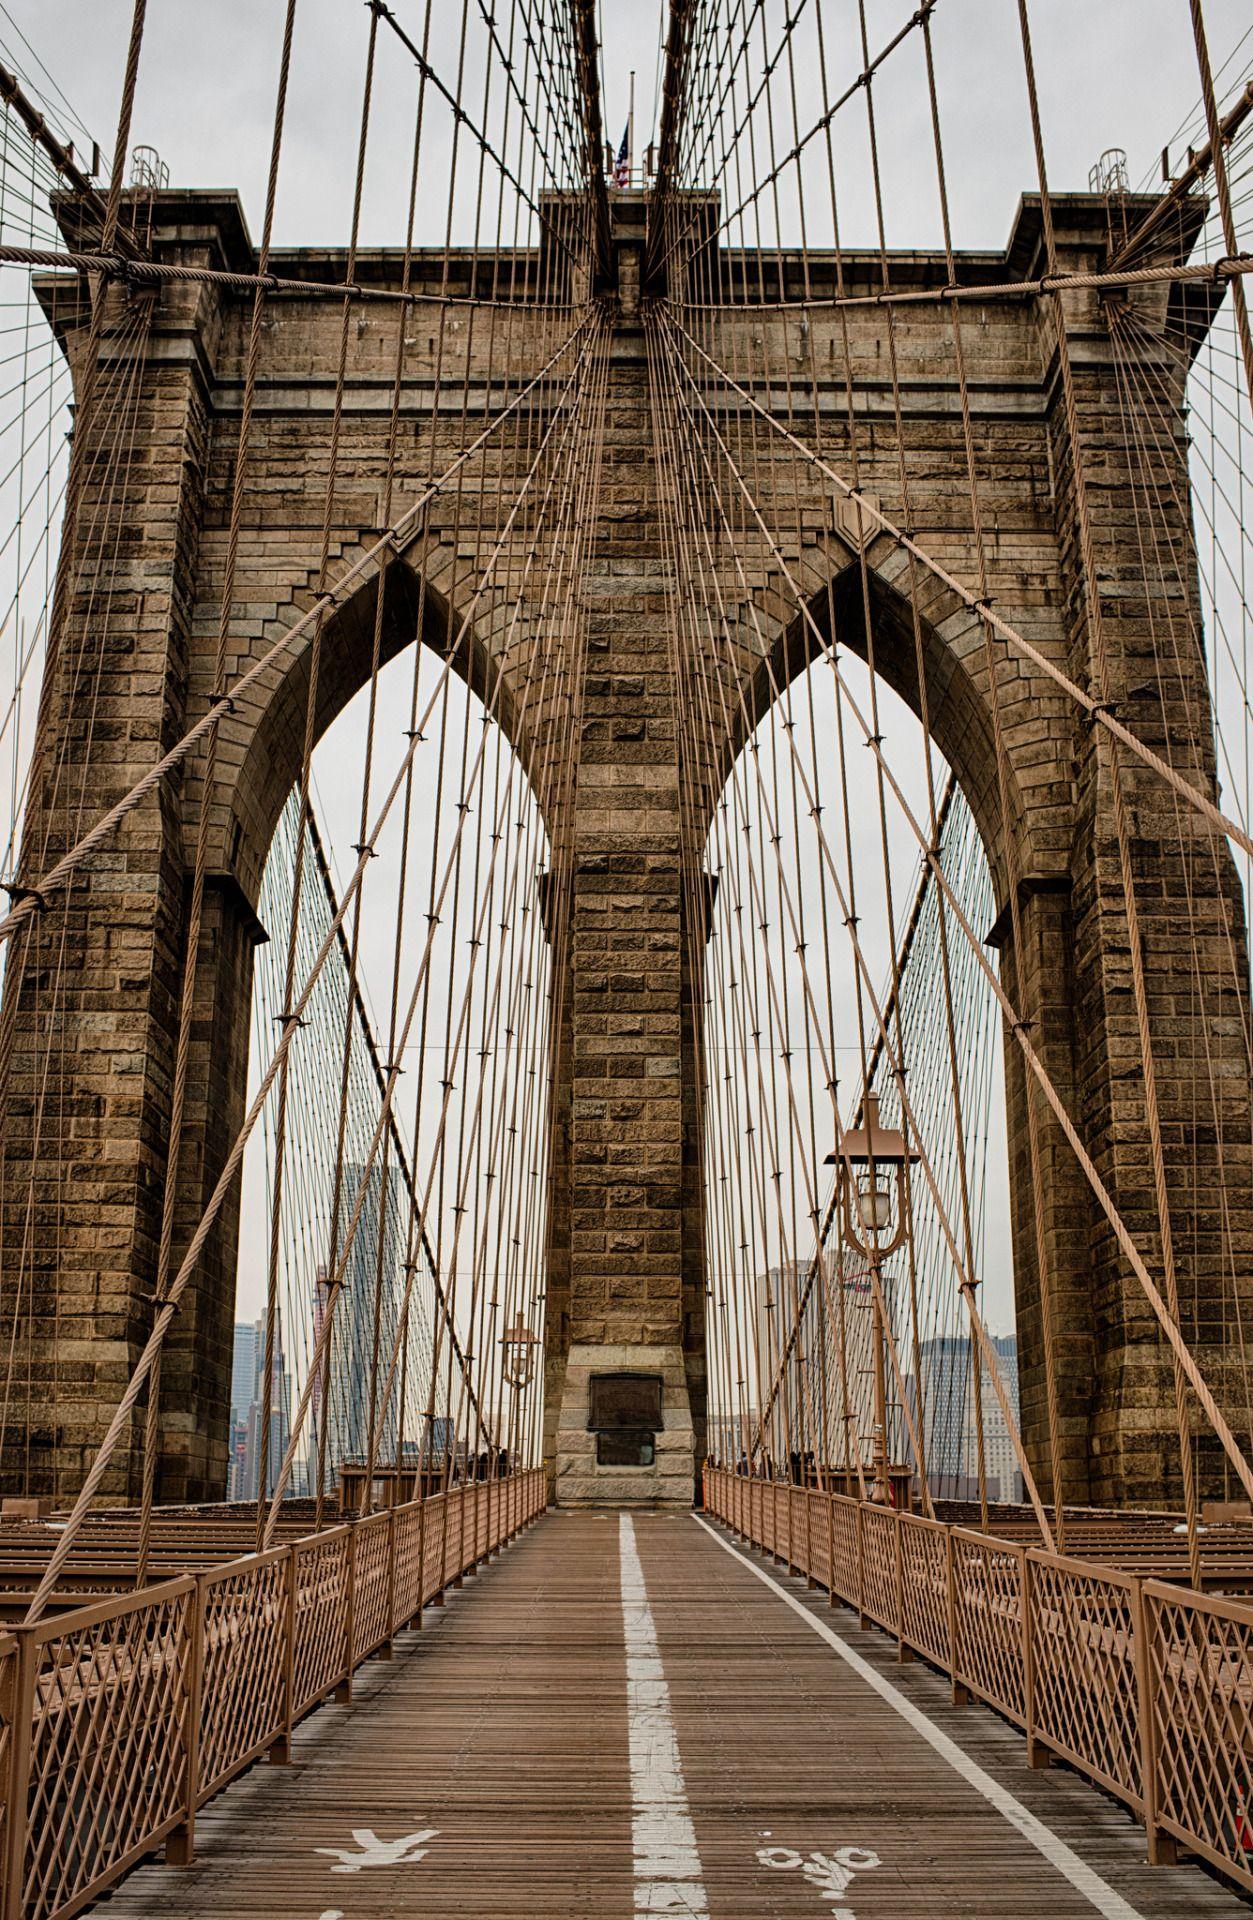 Amazing Places aboutusa Brooklyn Bridge New York